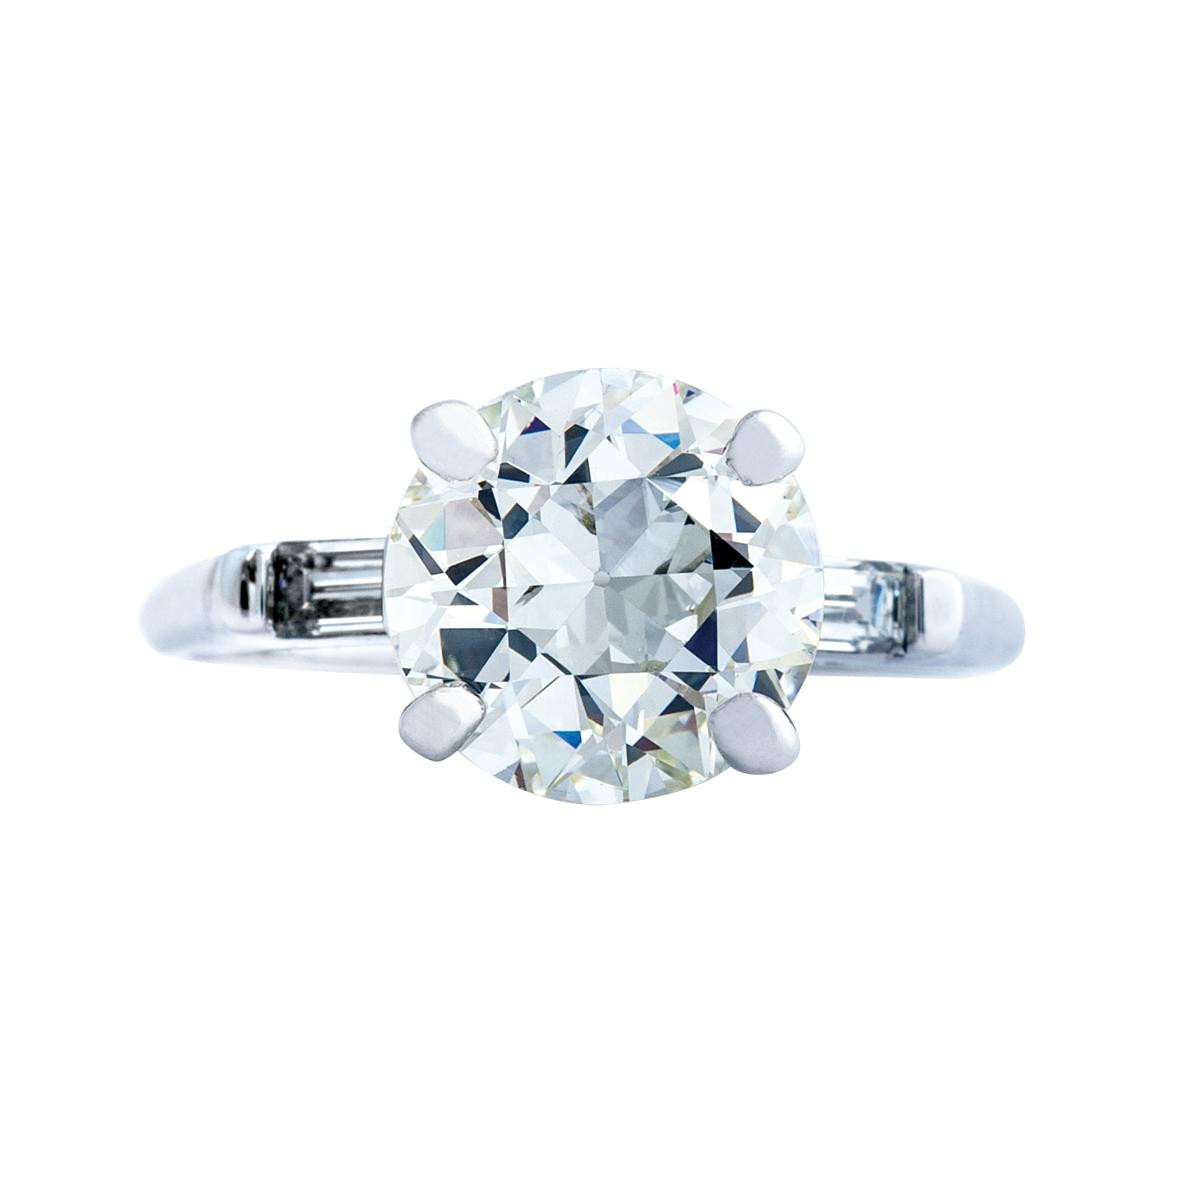 Vintage 2.34 CTW Old European Cut Diamond Ring